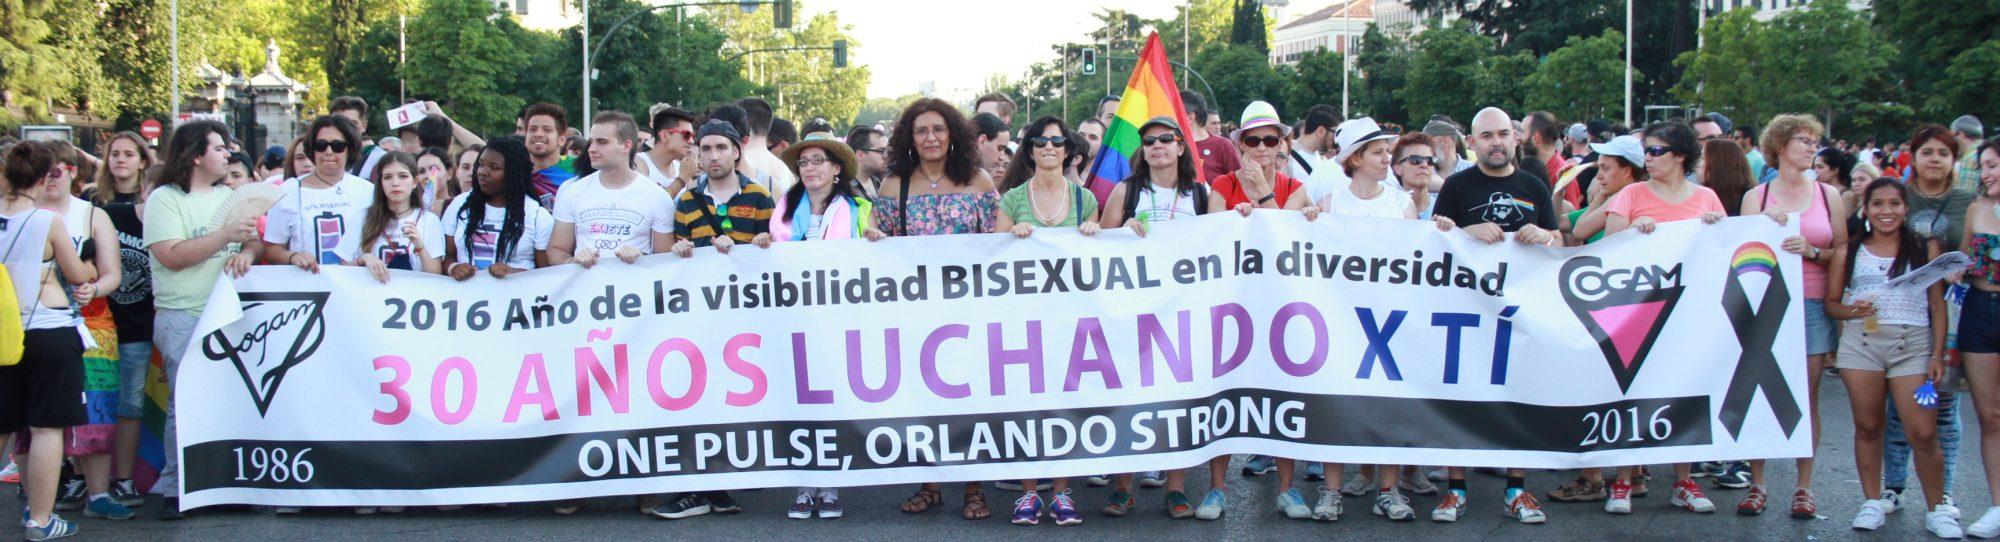 Colectivo LGTB+ de Madrid